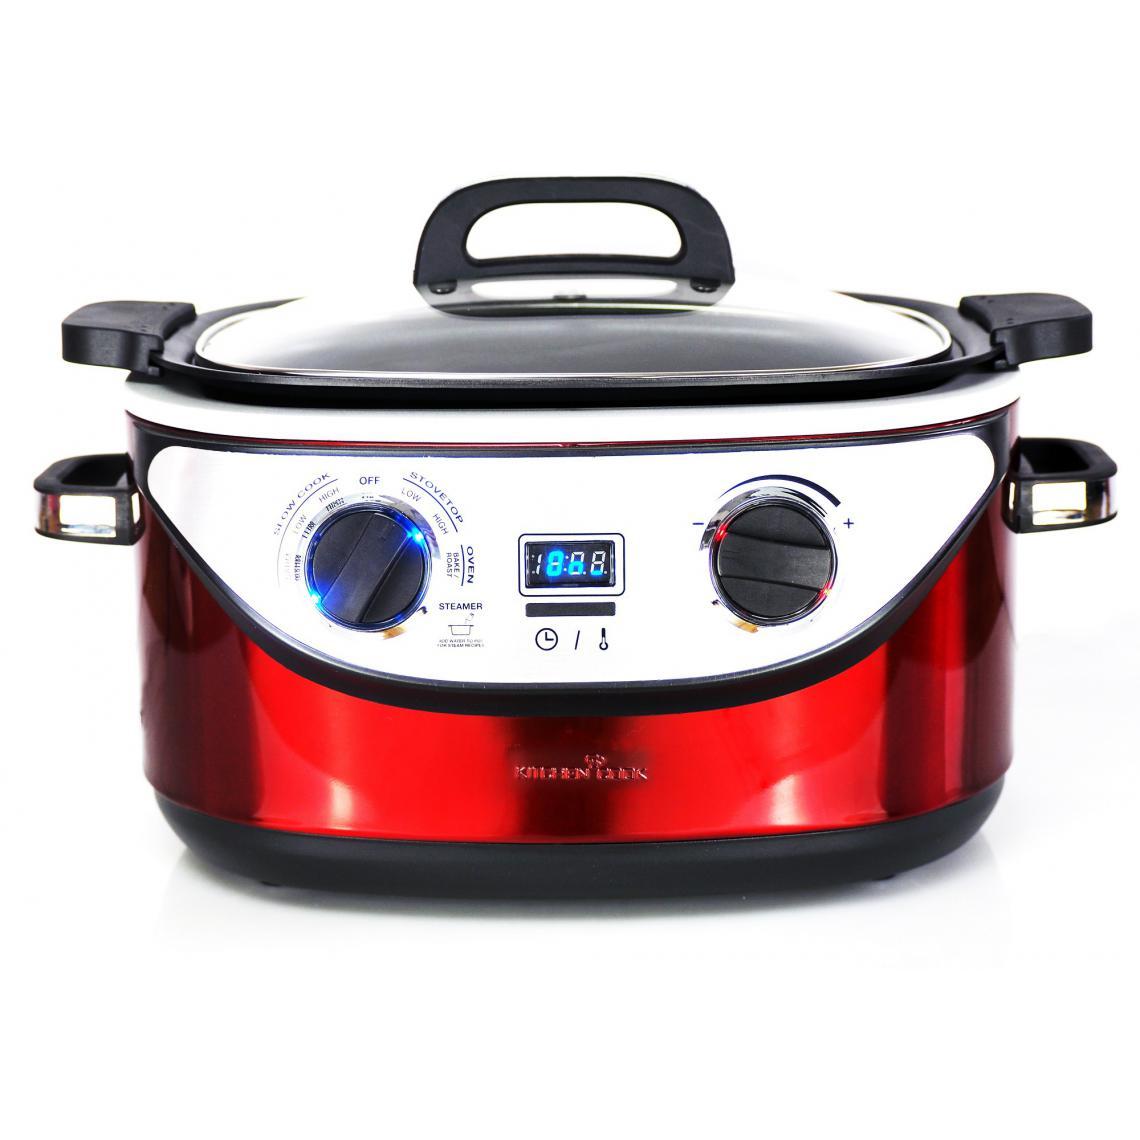 Kitchencook Multicuiseur Cookotte - 8 programmes - 5.6l - Inox Rouge